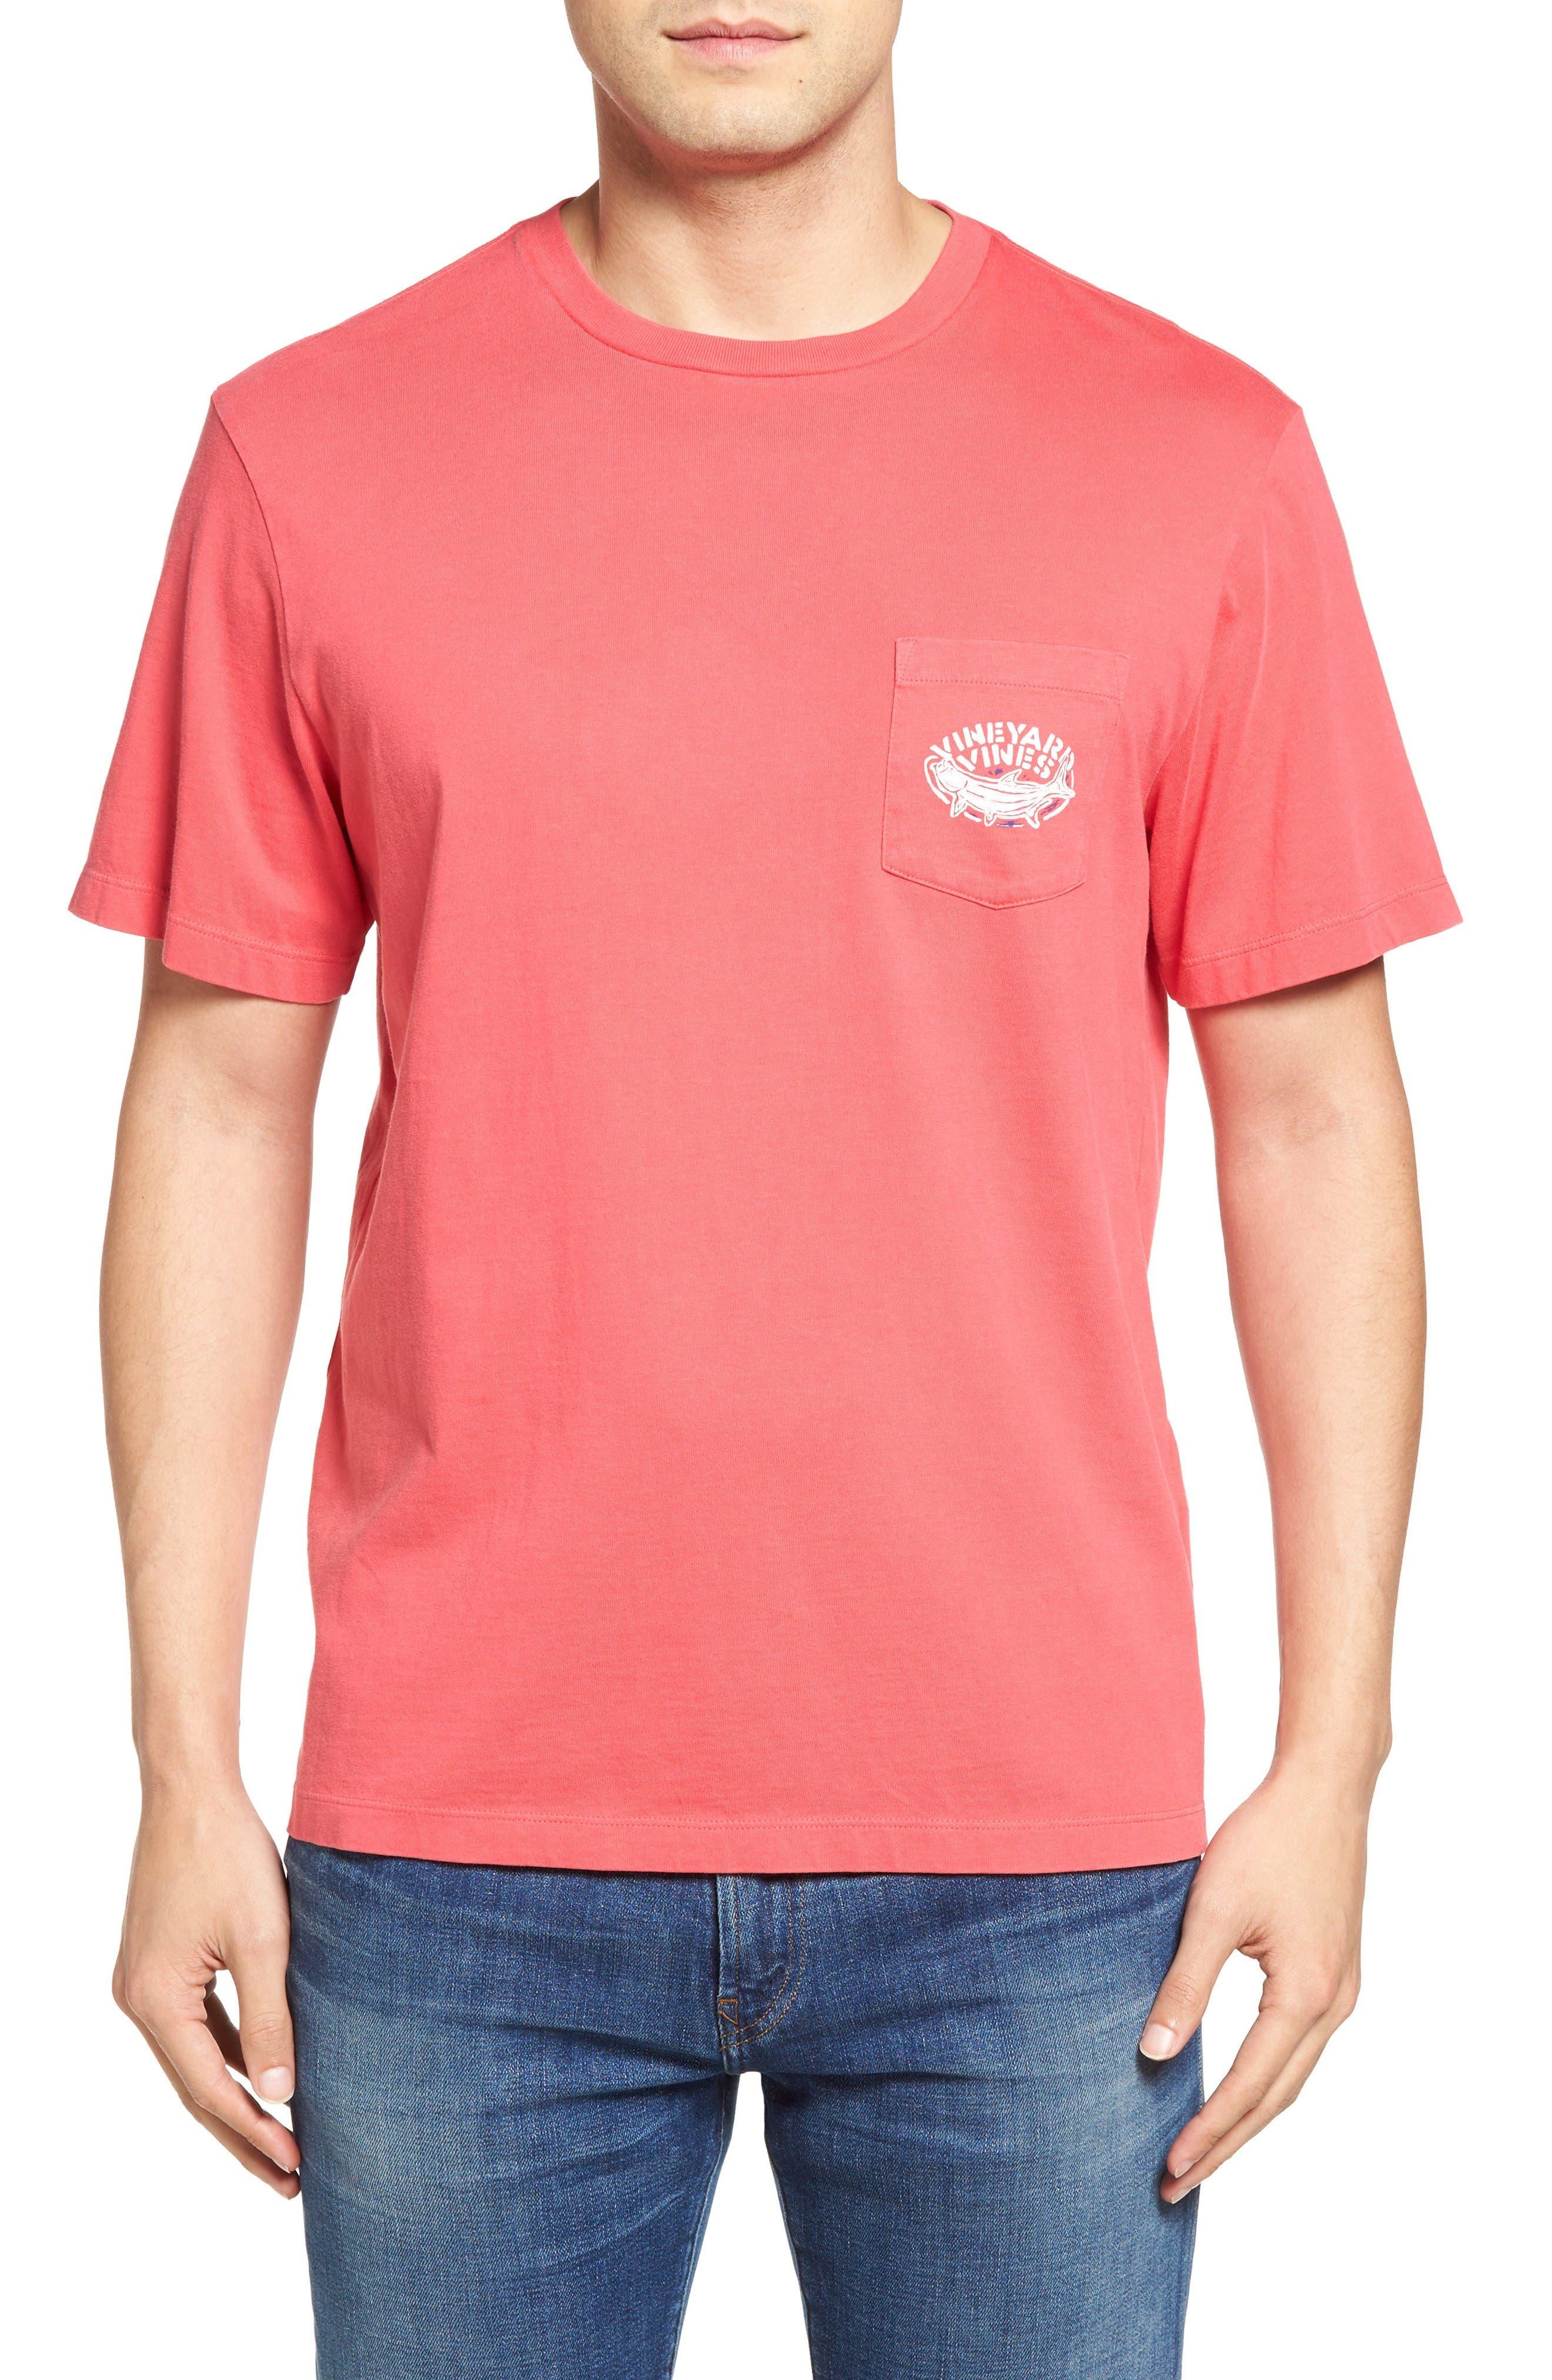 Alternate Image 2  - Vineyard Vines Stencil Tarpon Graphic Pocket T-Shirt